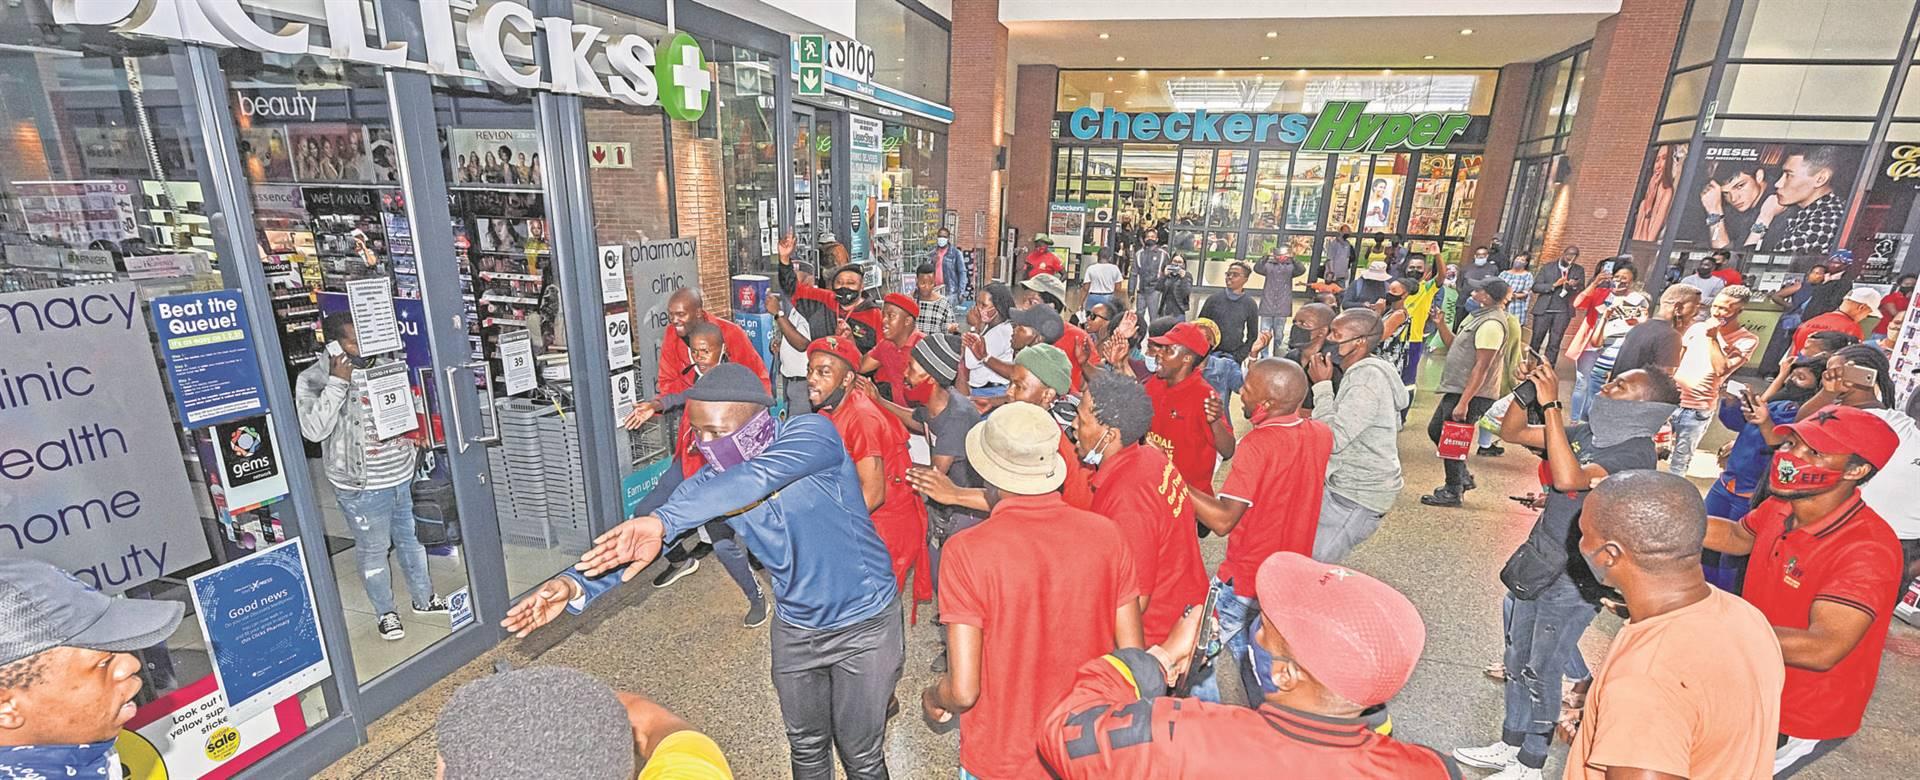 EFF shut down Clicks Stores. BELOW: An EFF crowd arrives at Liberty Midlands Mall. PHOTOS: Moeketsi Mamane